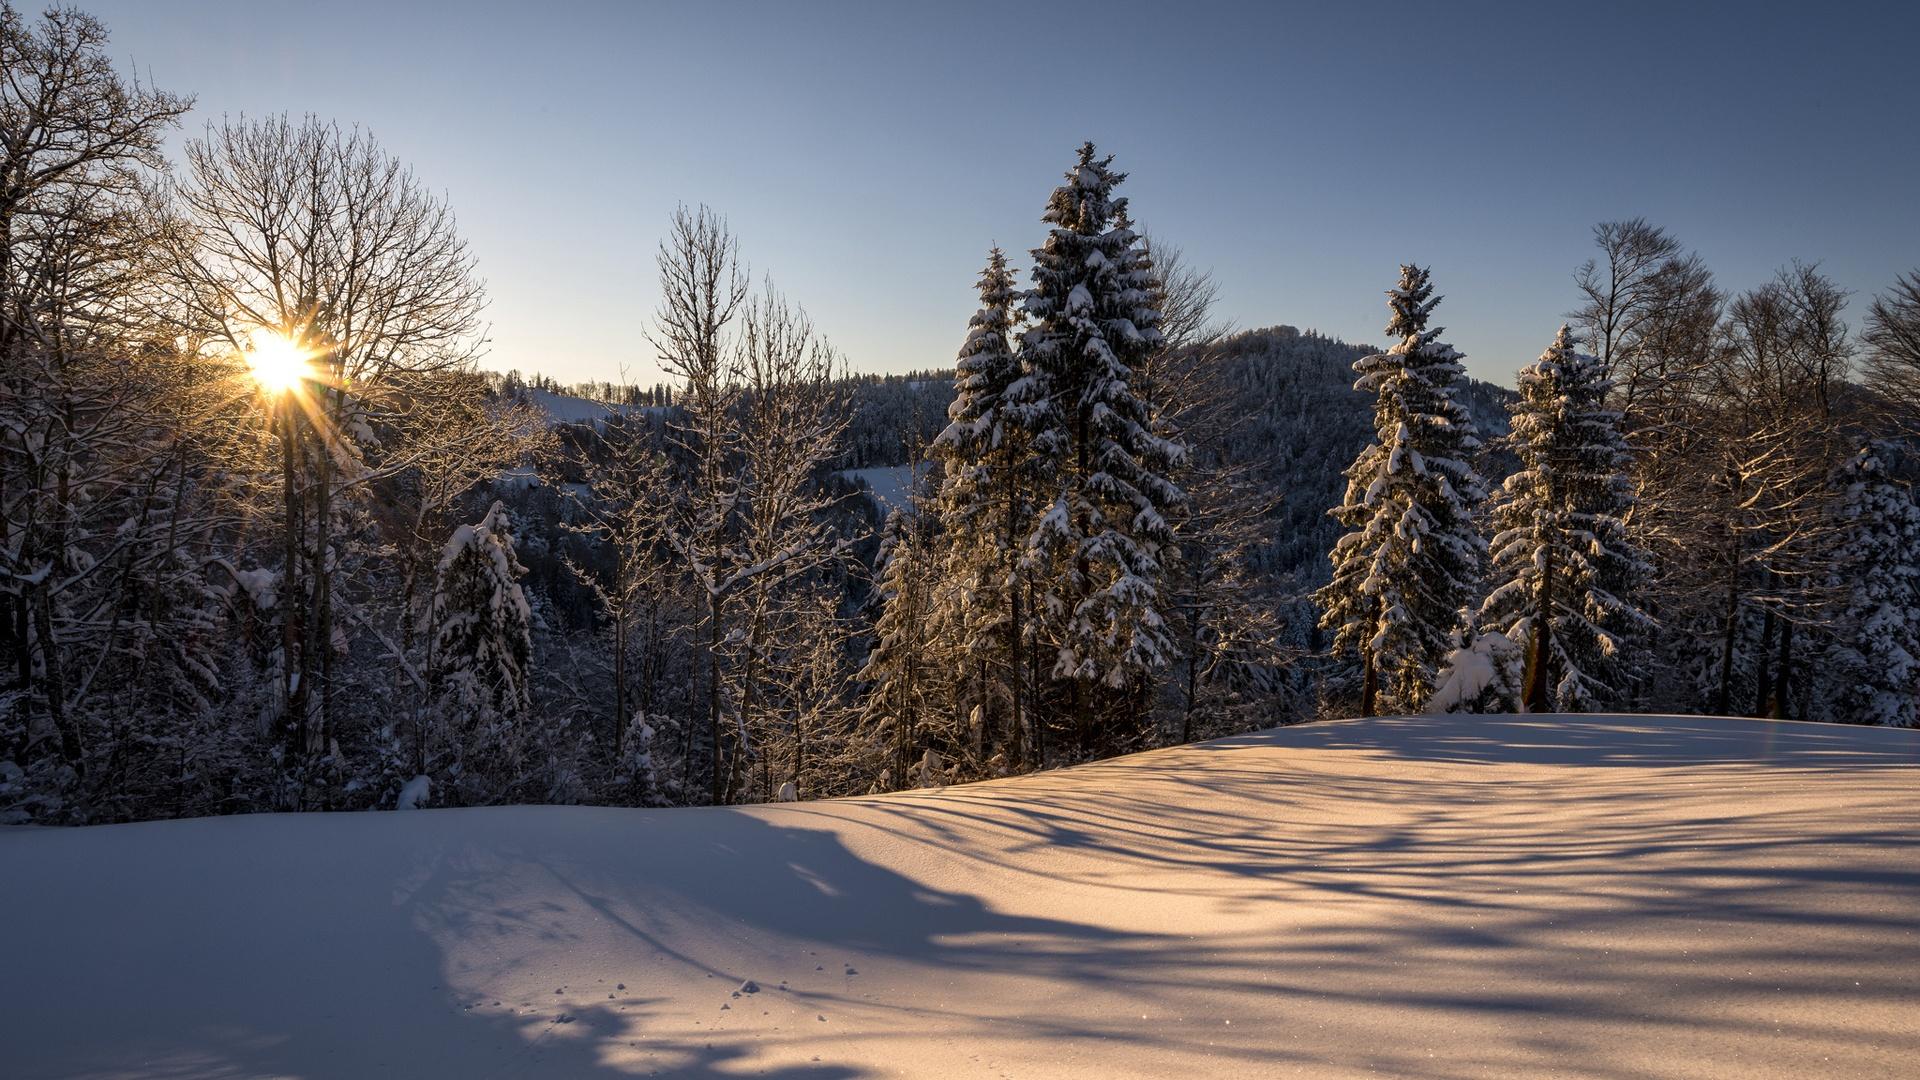 Winter landscape morning sun forest snow wallpaper 1920x1080